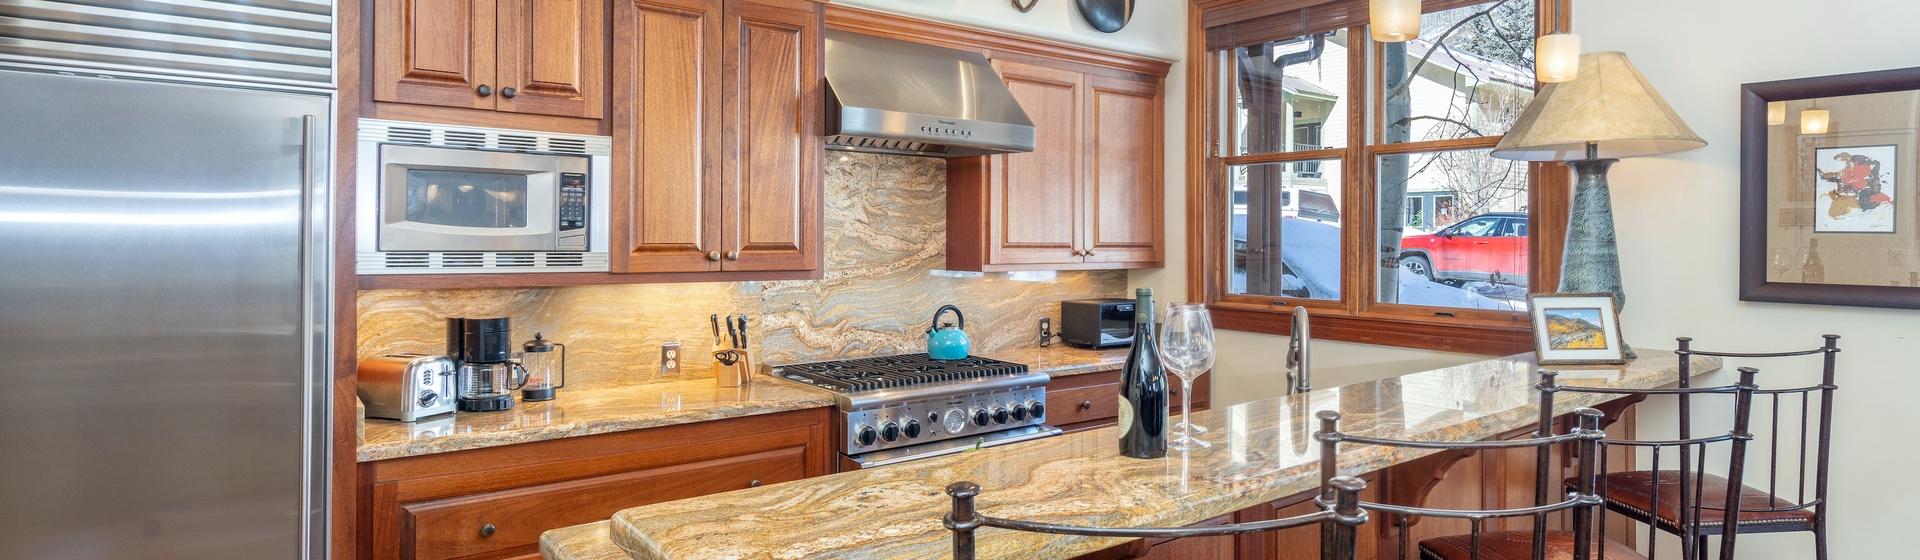 1.05-telluride-tres-casas-B-kitchen-web.jpg